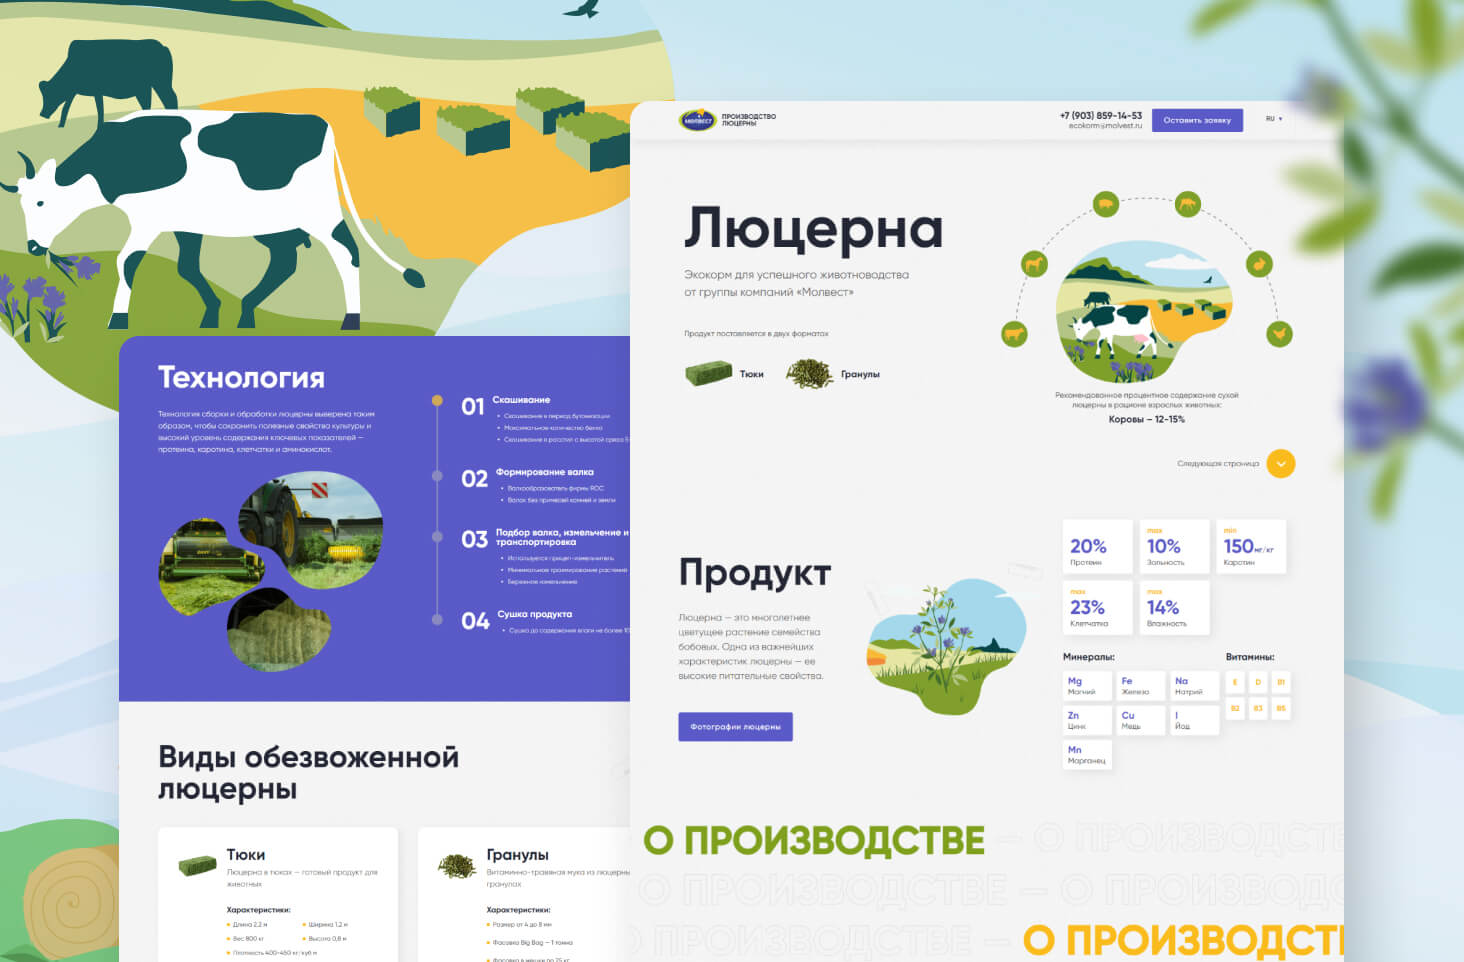 russianalfalfa.com